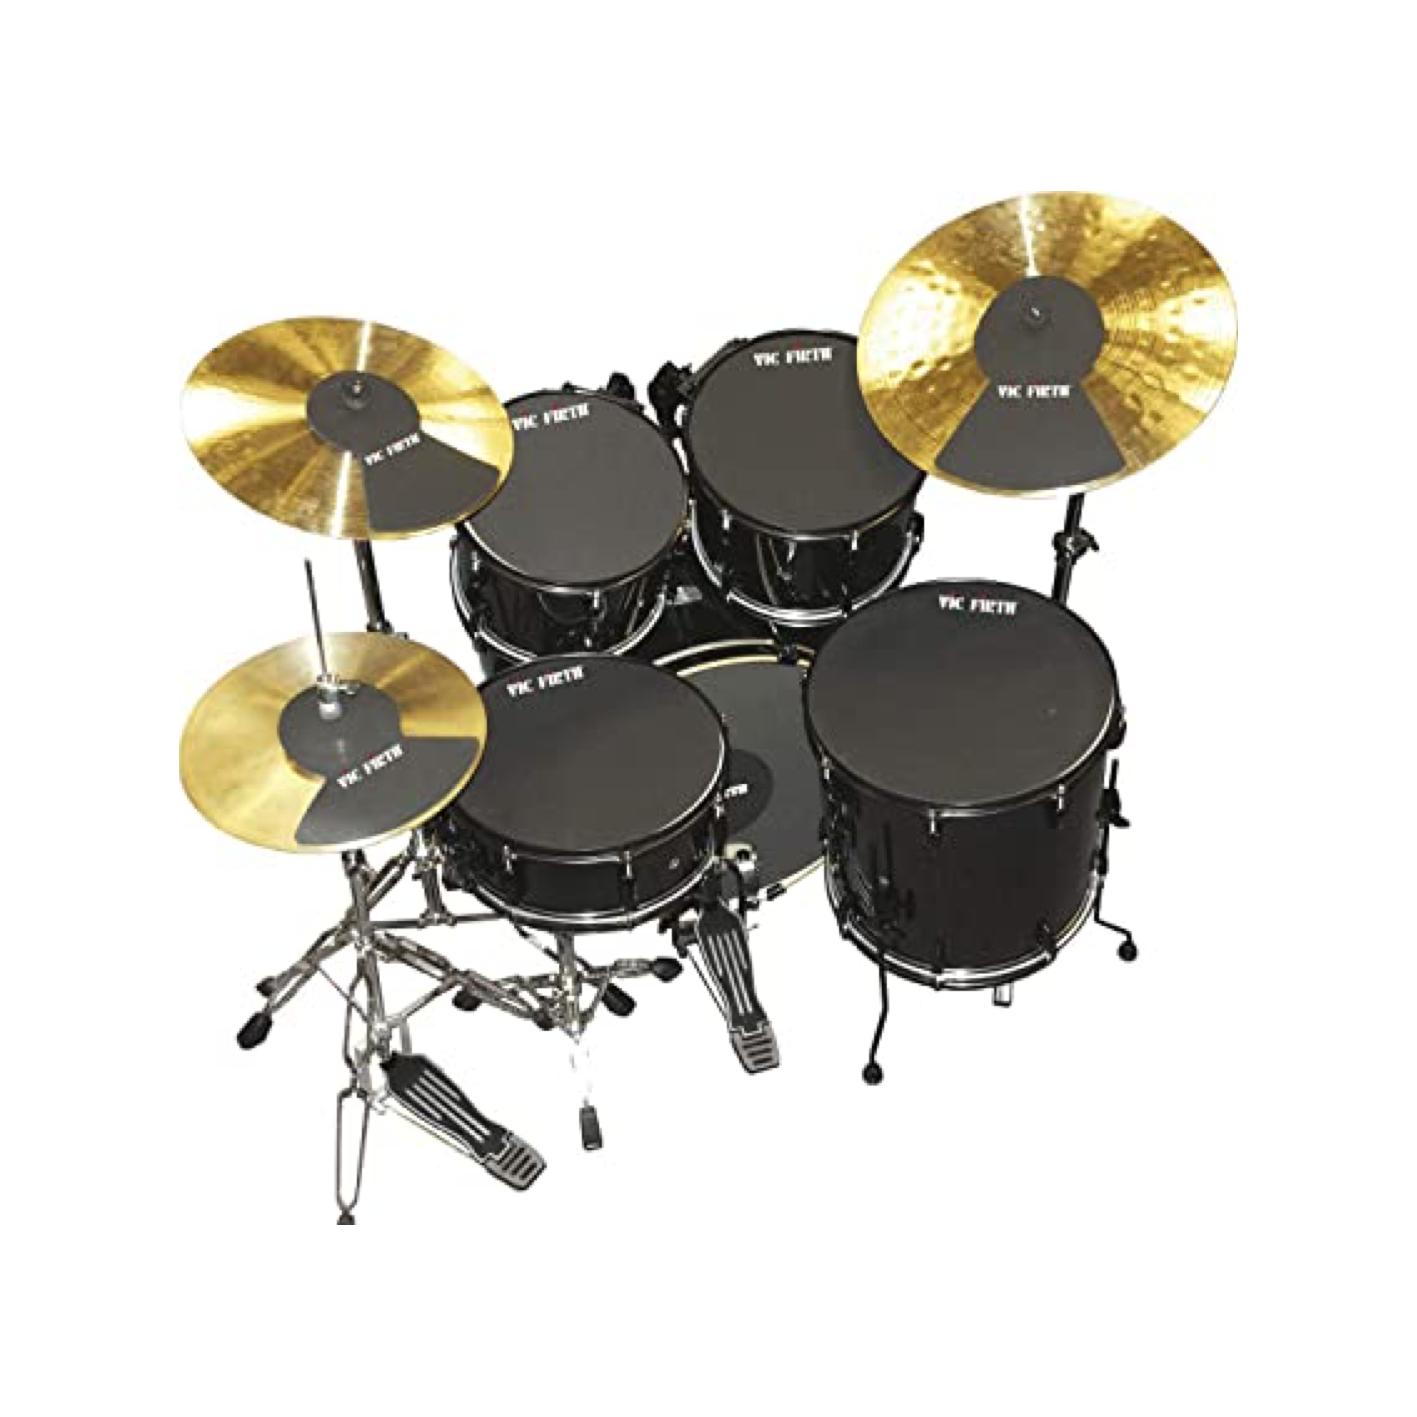 "Vic Firth MUTEPP7 Drum Mute Pack (18"" Sizes)"